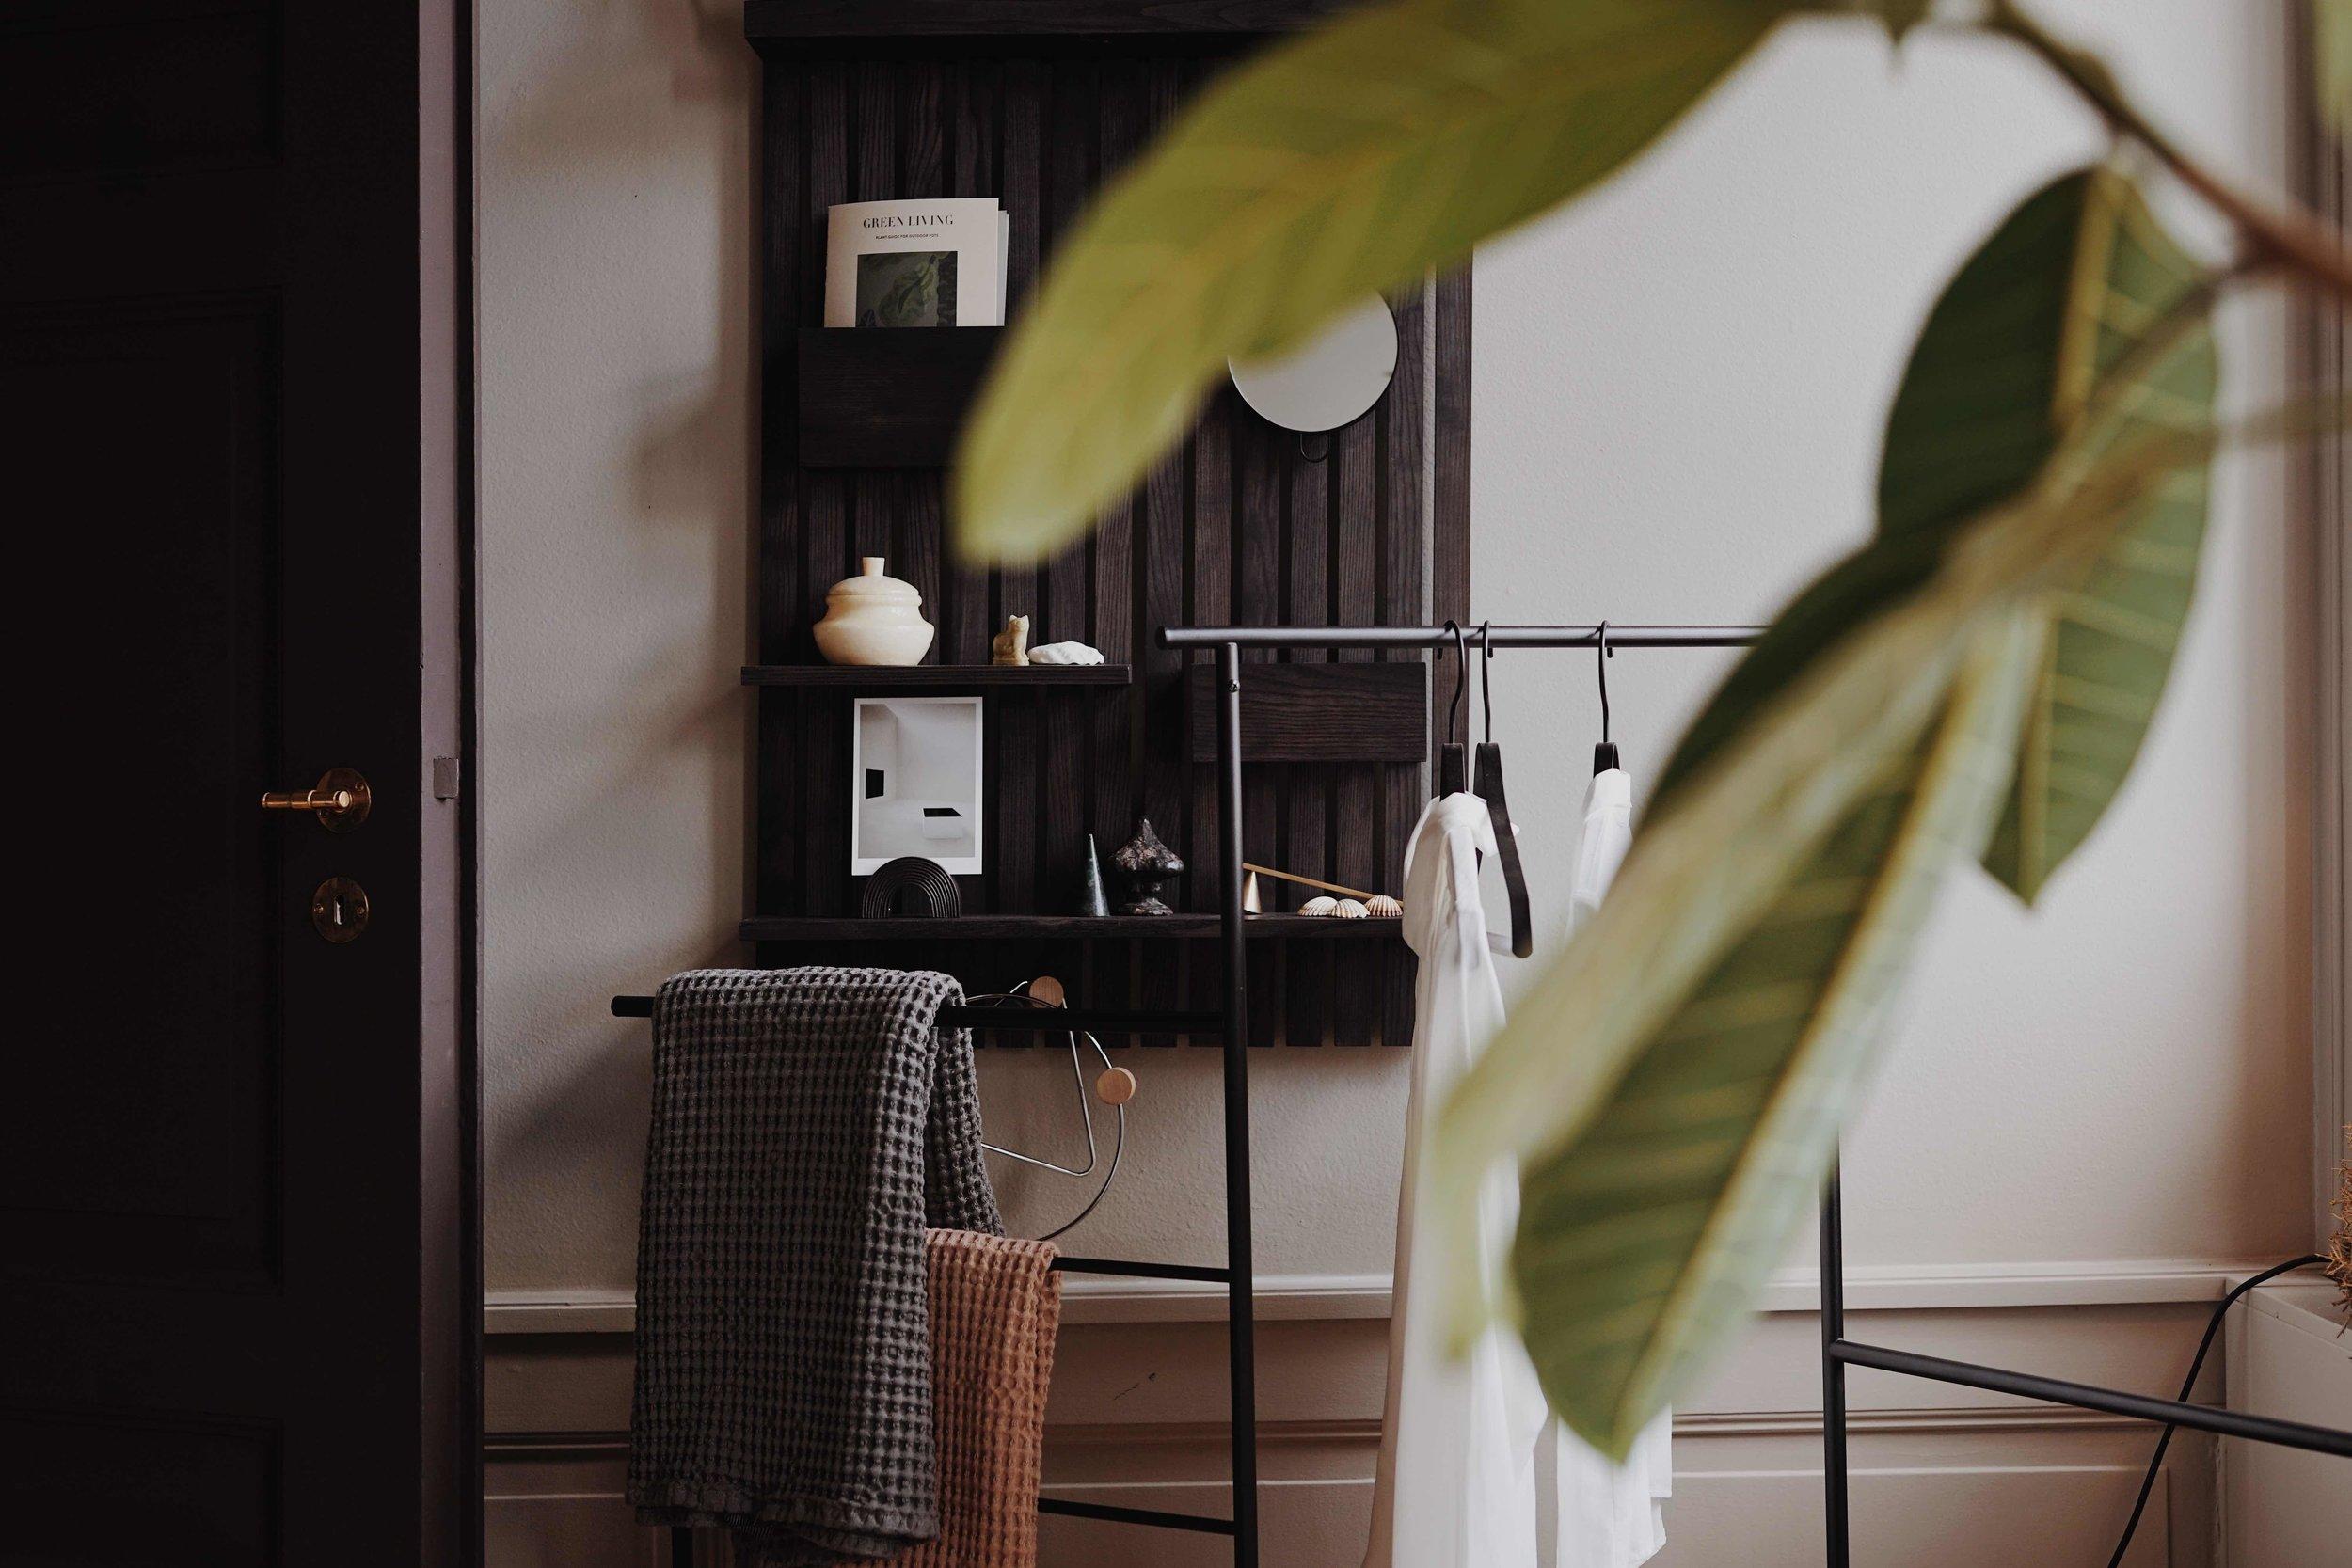 ASROSENVINGE_Ferm_Living_Open_Showroom_The_Home_36_LowRes.jpeg